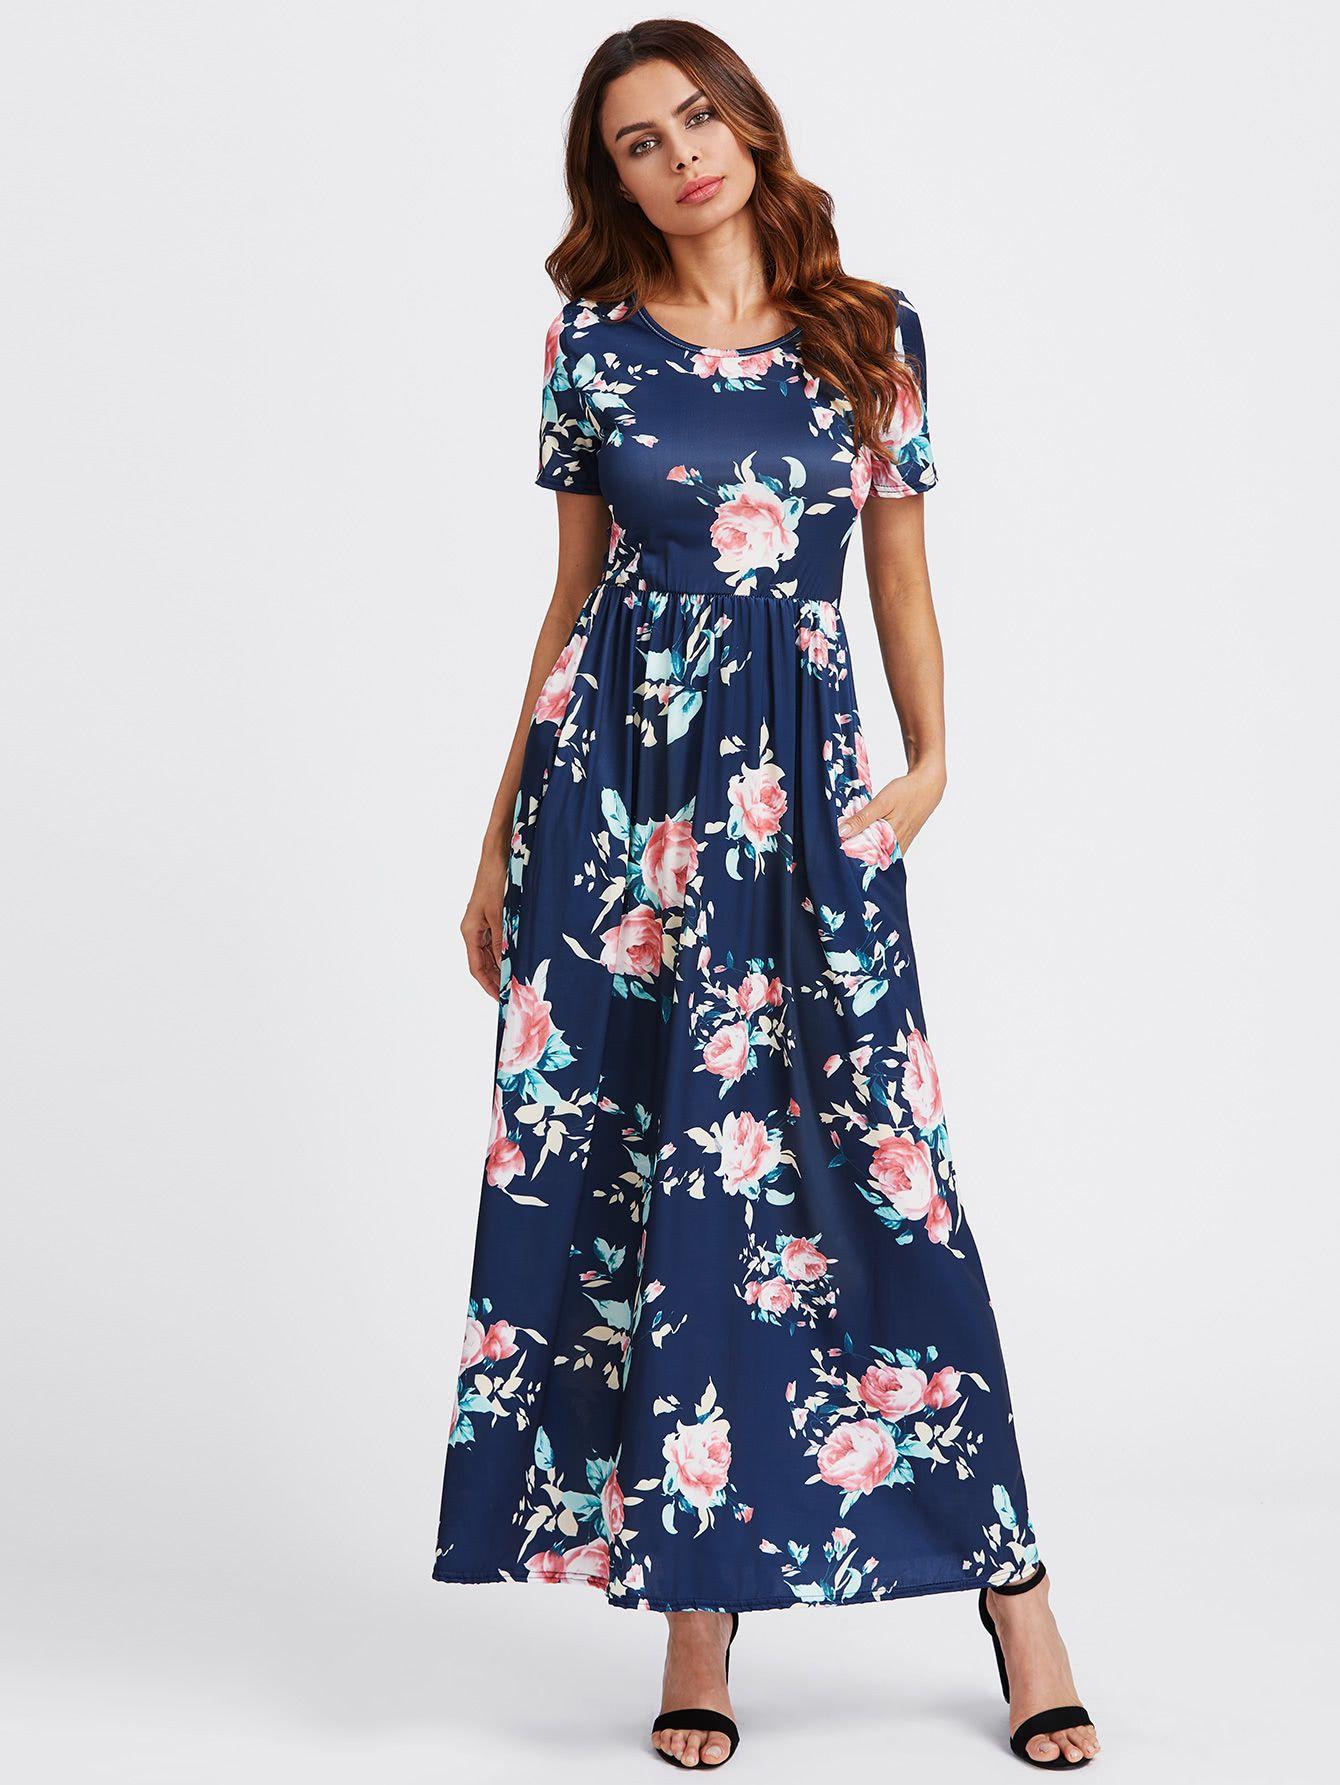 Navy W Pink Flower Print Maxi Dress Hem Above Ankles Round Neck Short Straight Sleeves Polyeste Floral Lace Maxi Dress Maxi Dress Floral Wrap Maxi Dress [ 1785 x 1340 Pixel ]